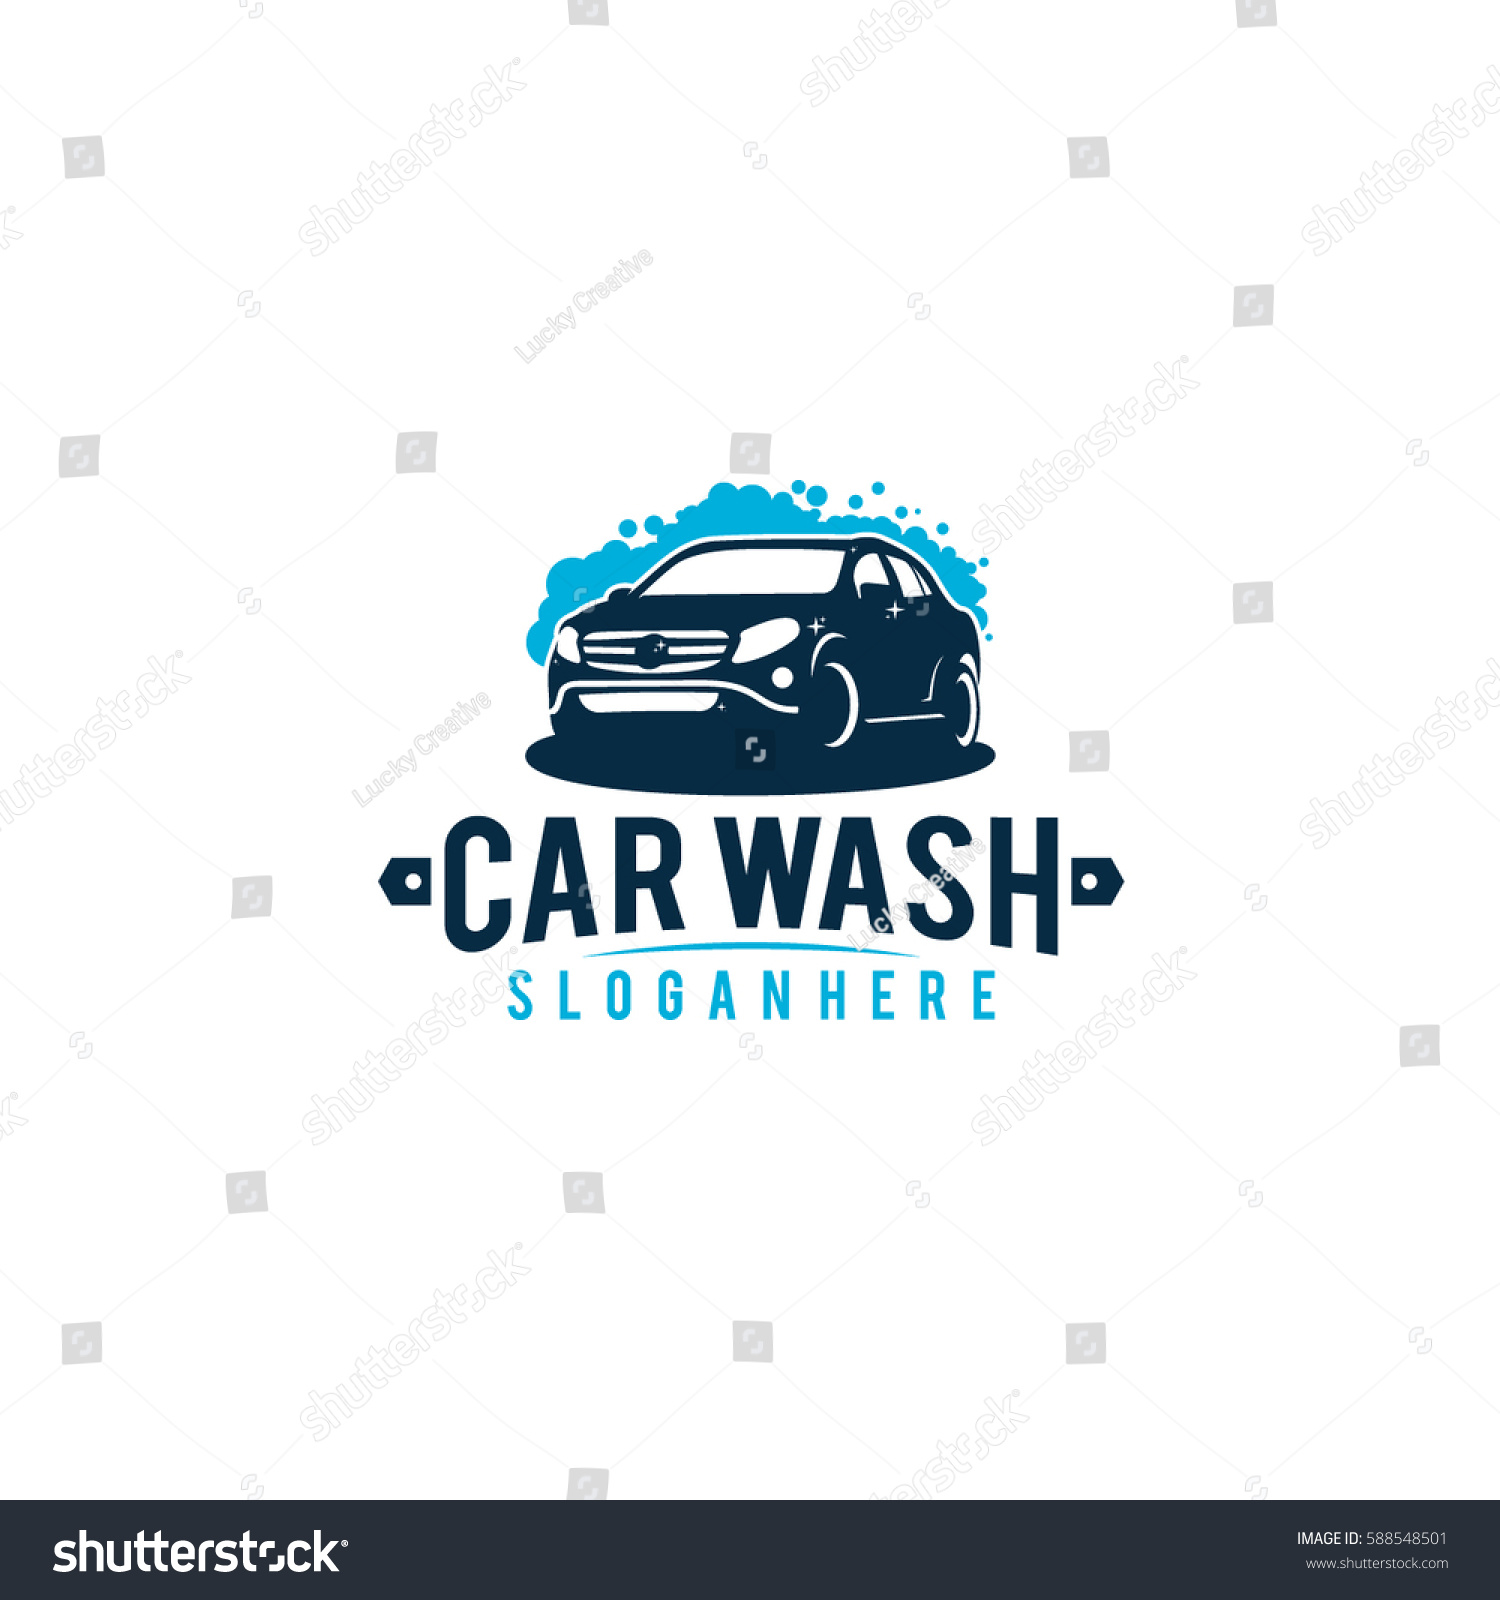 Car Wash Vintage Stock Footage